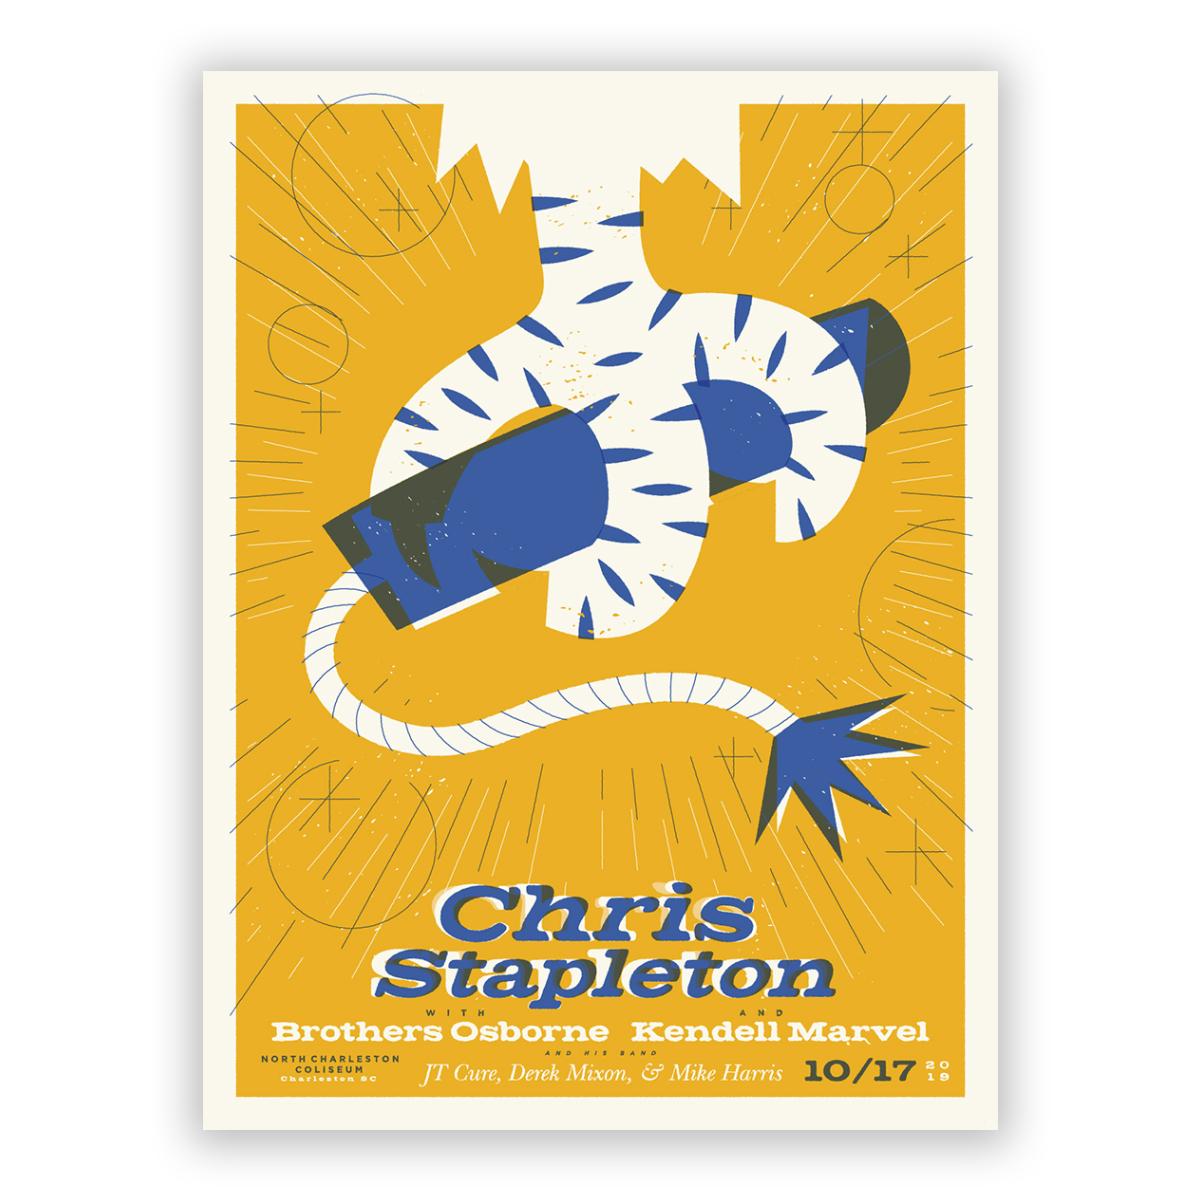 Chris Stapleton Show Poster – Charleston, SC 10/17/19